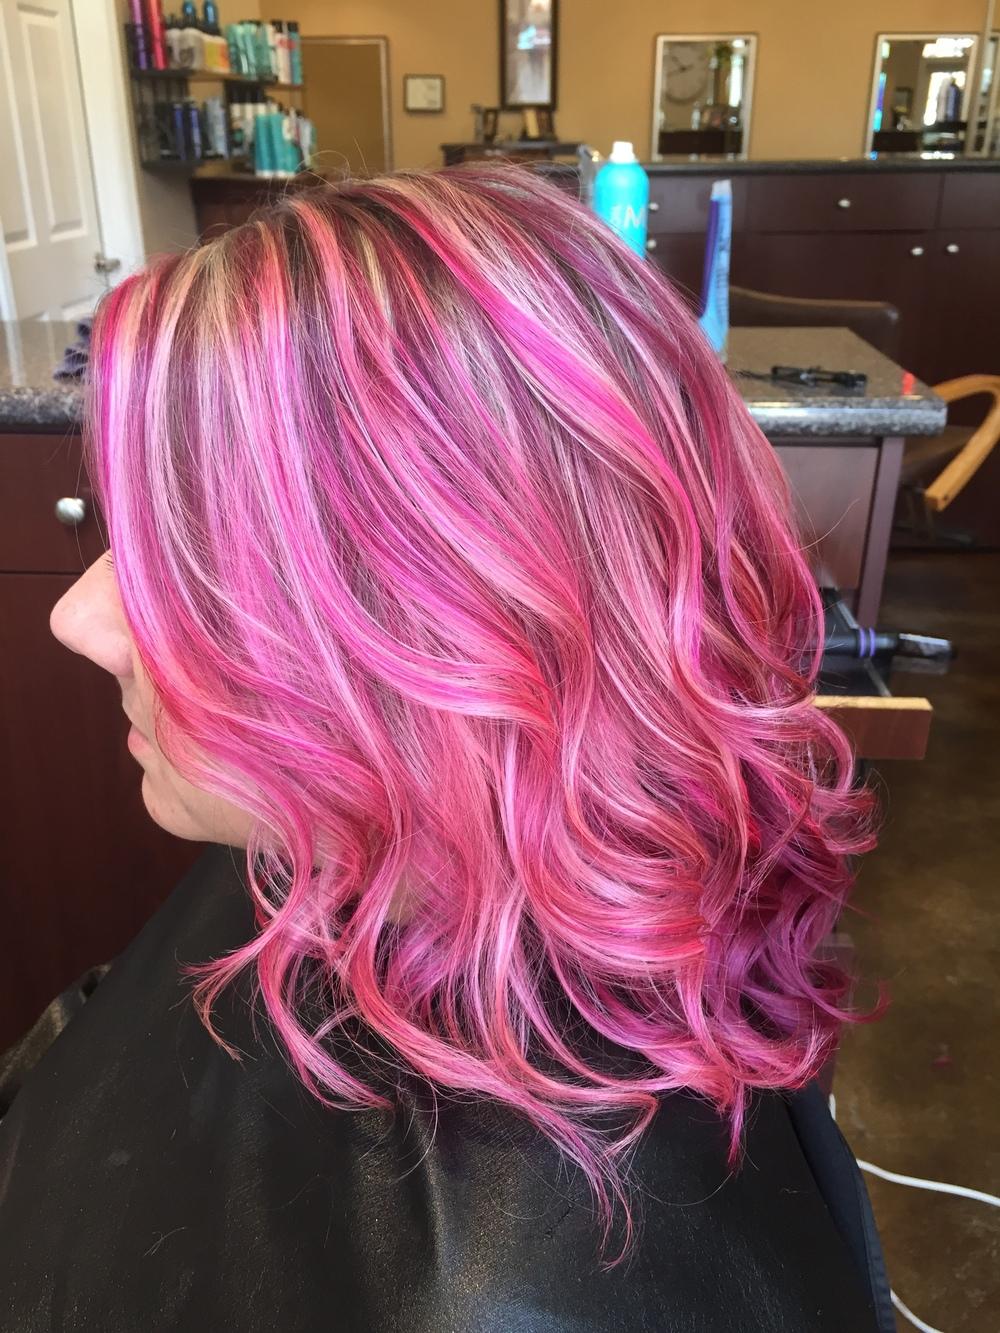 diva-salon-hair-color-2495.jpg